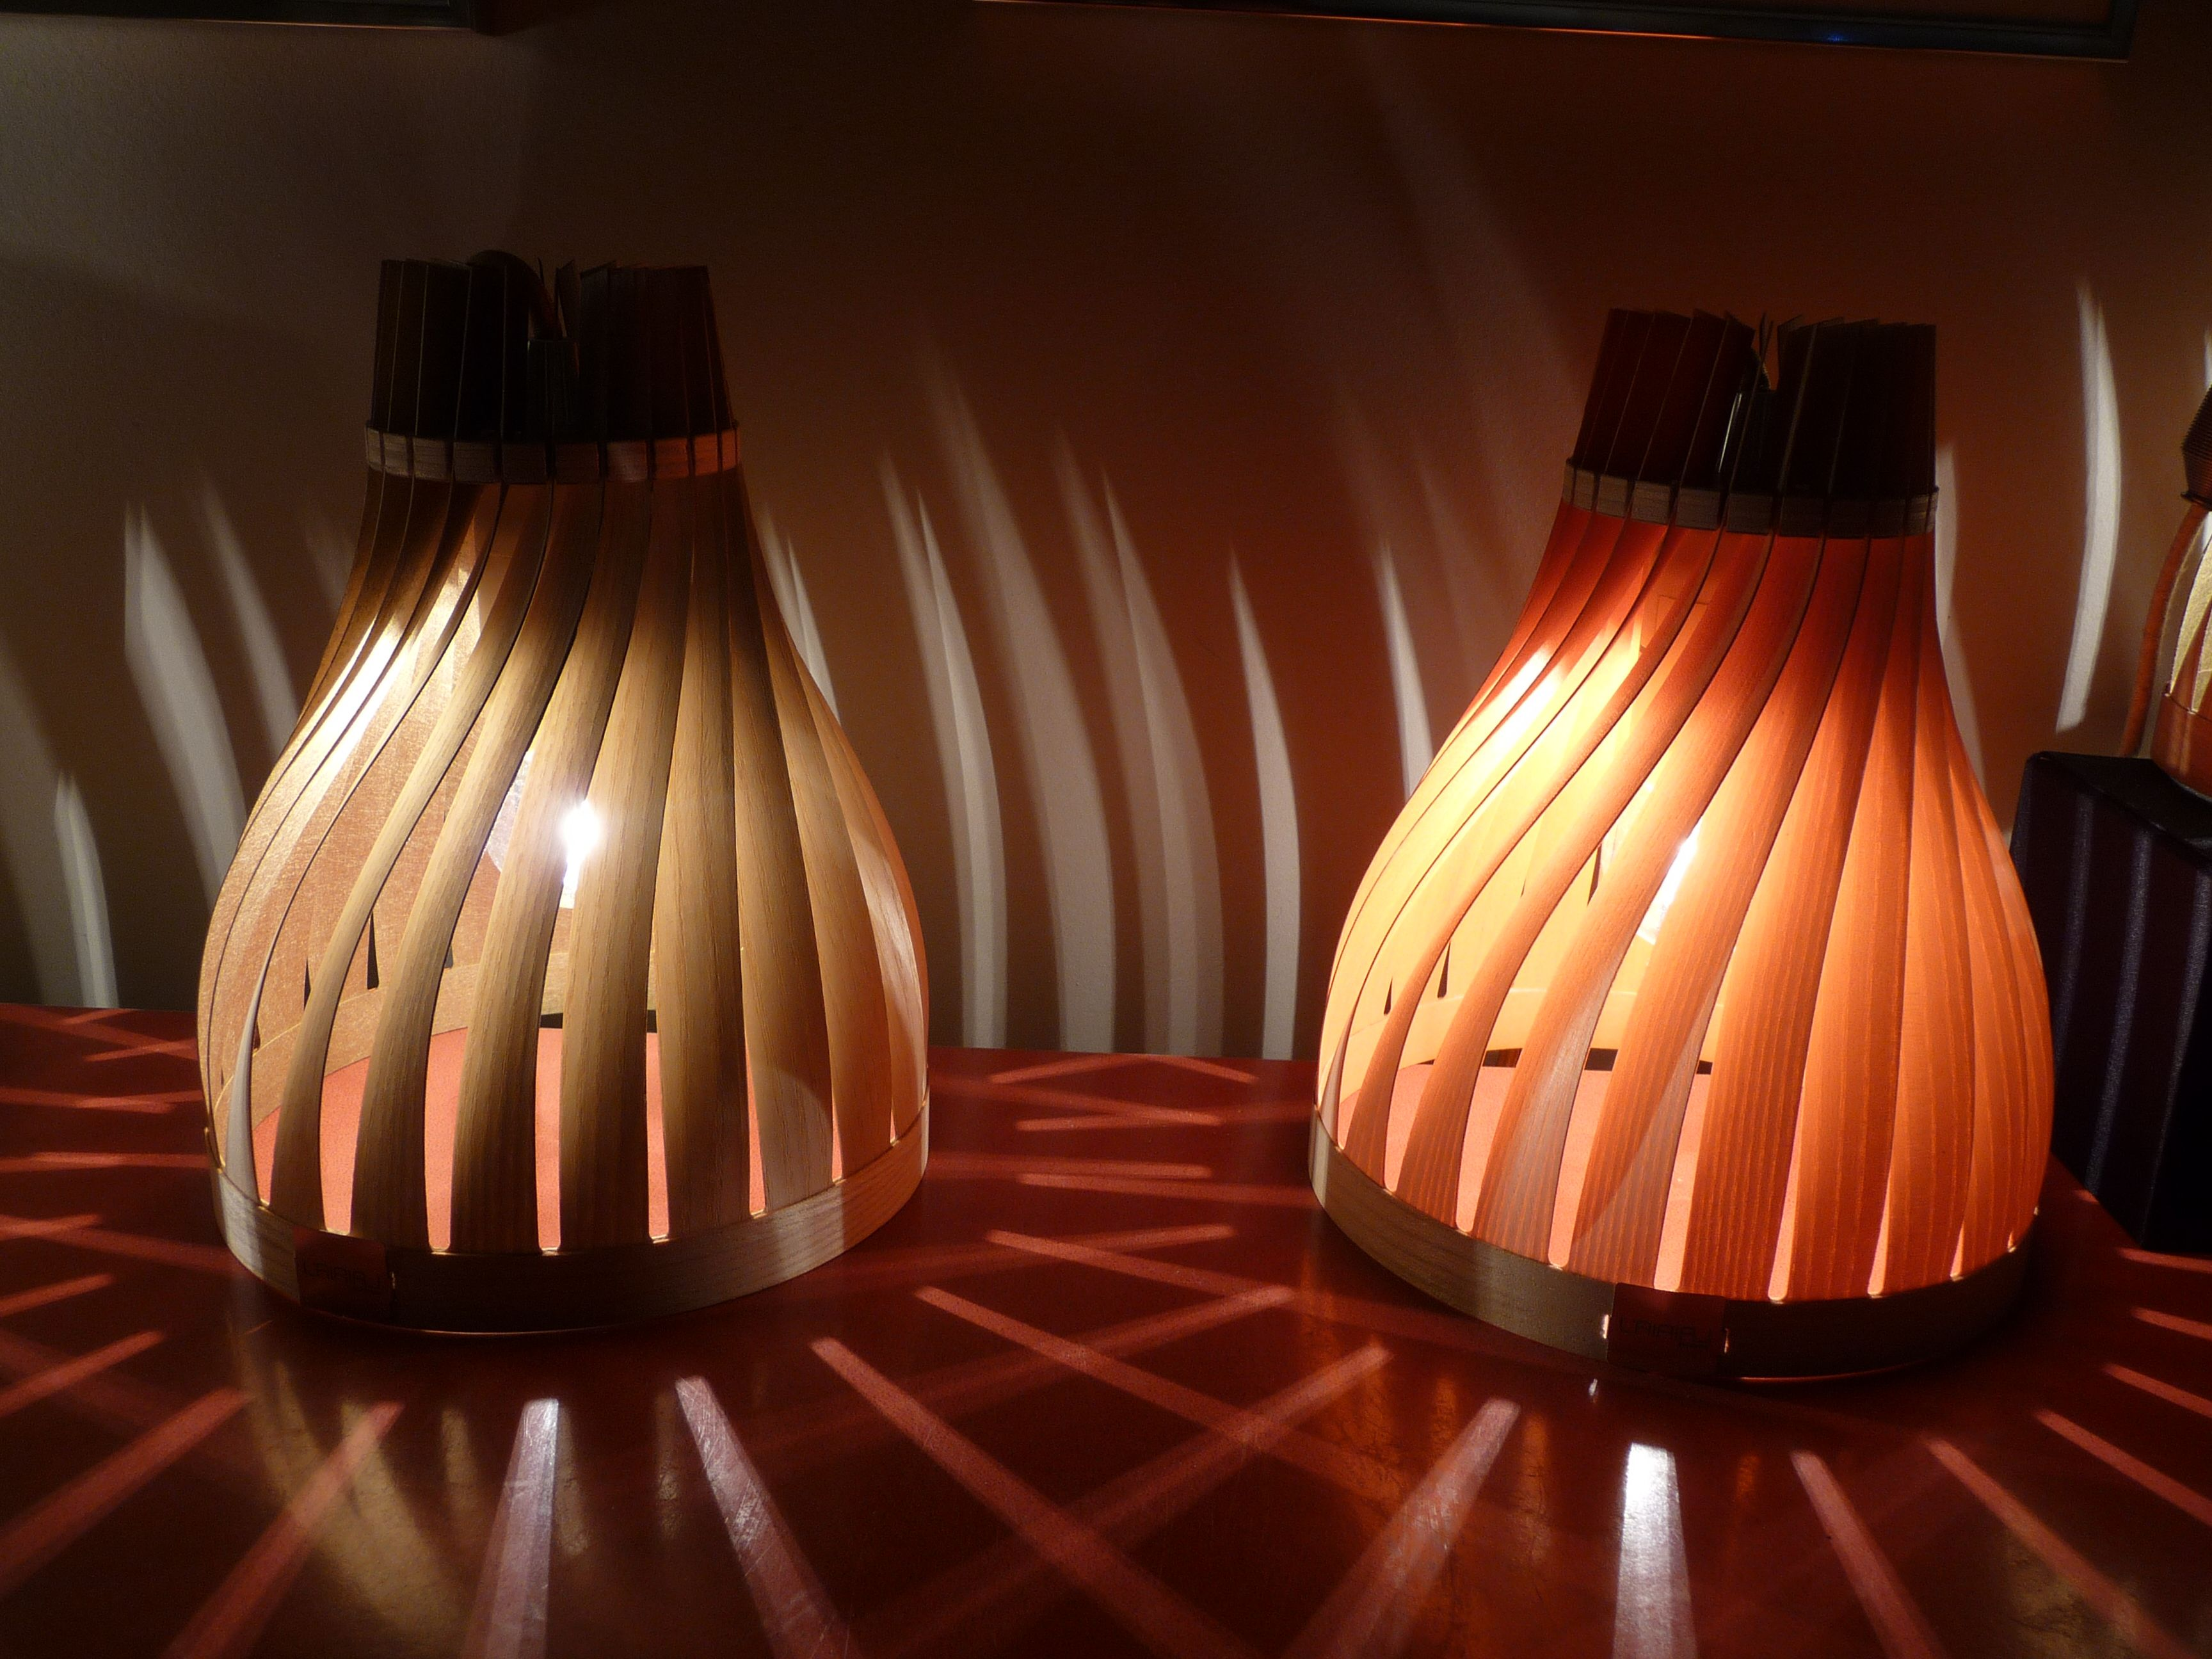 Luminaires lairial volupte chêne or zenith et frêne orange